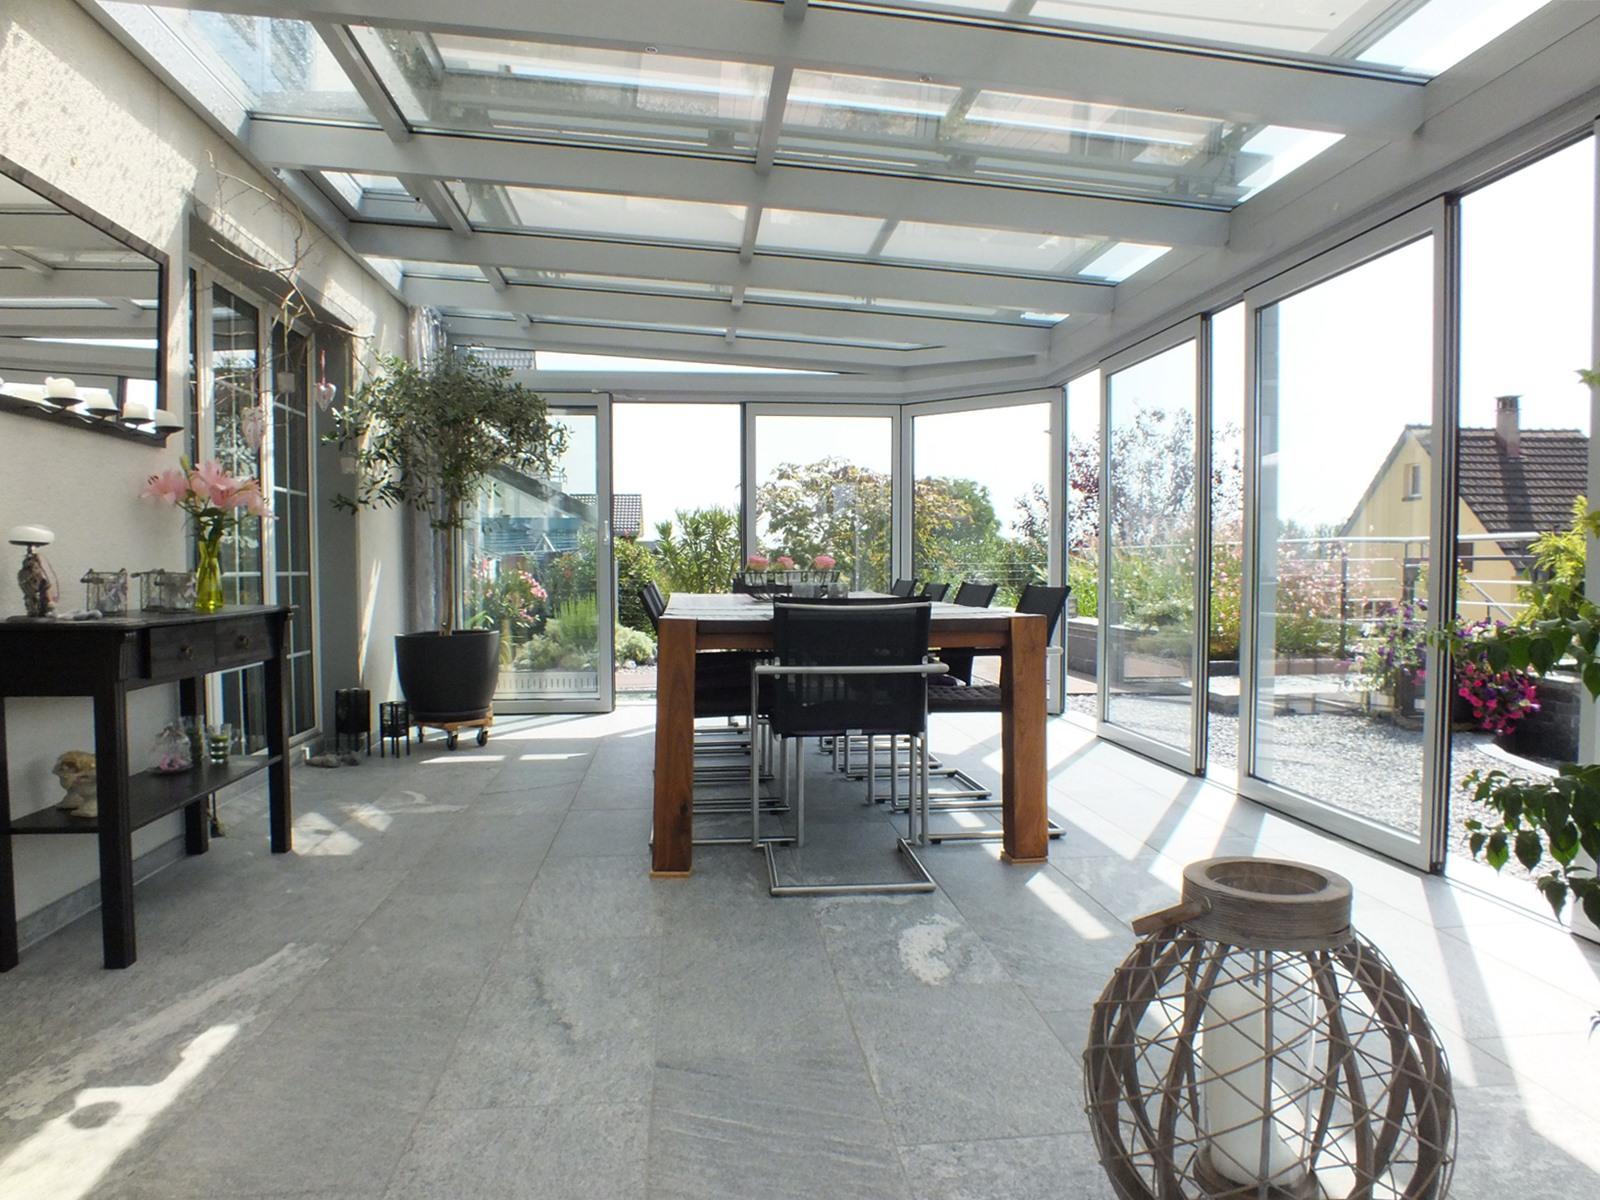 Wintergarten - Movitec AG